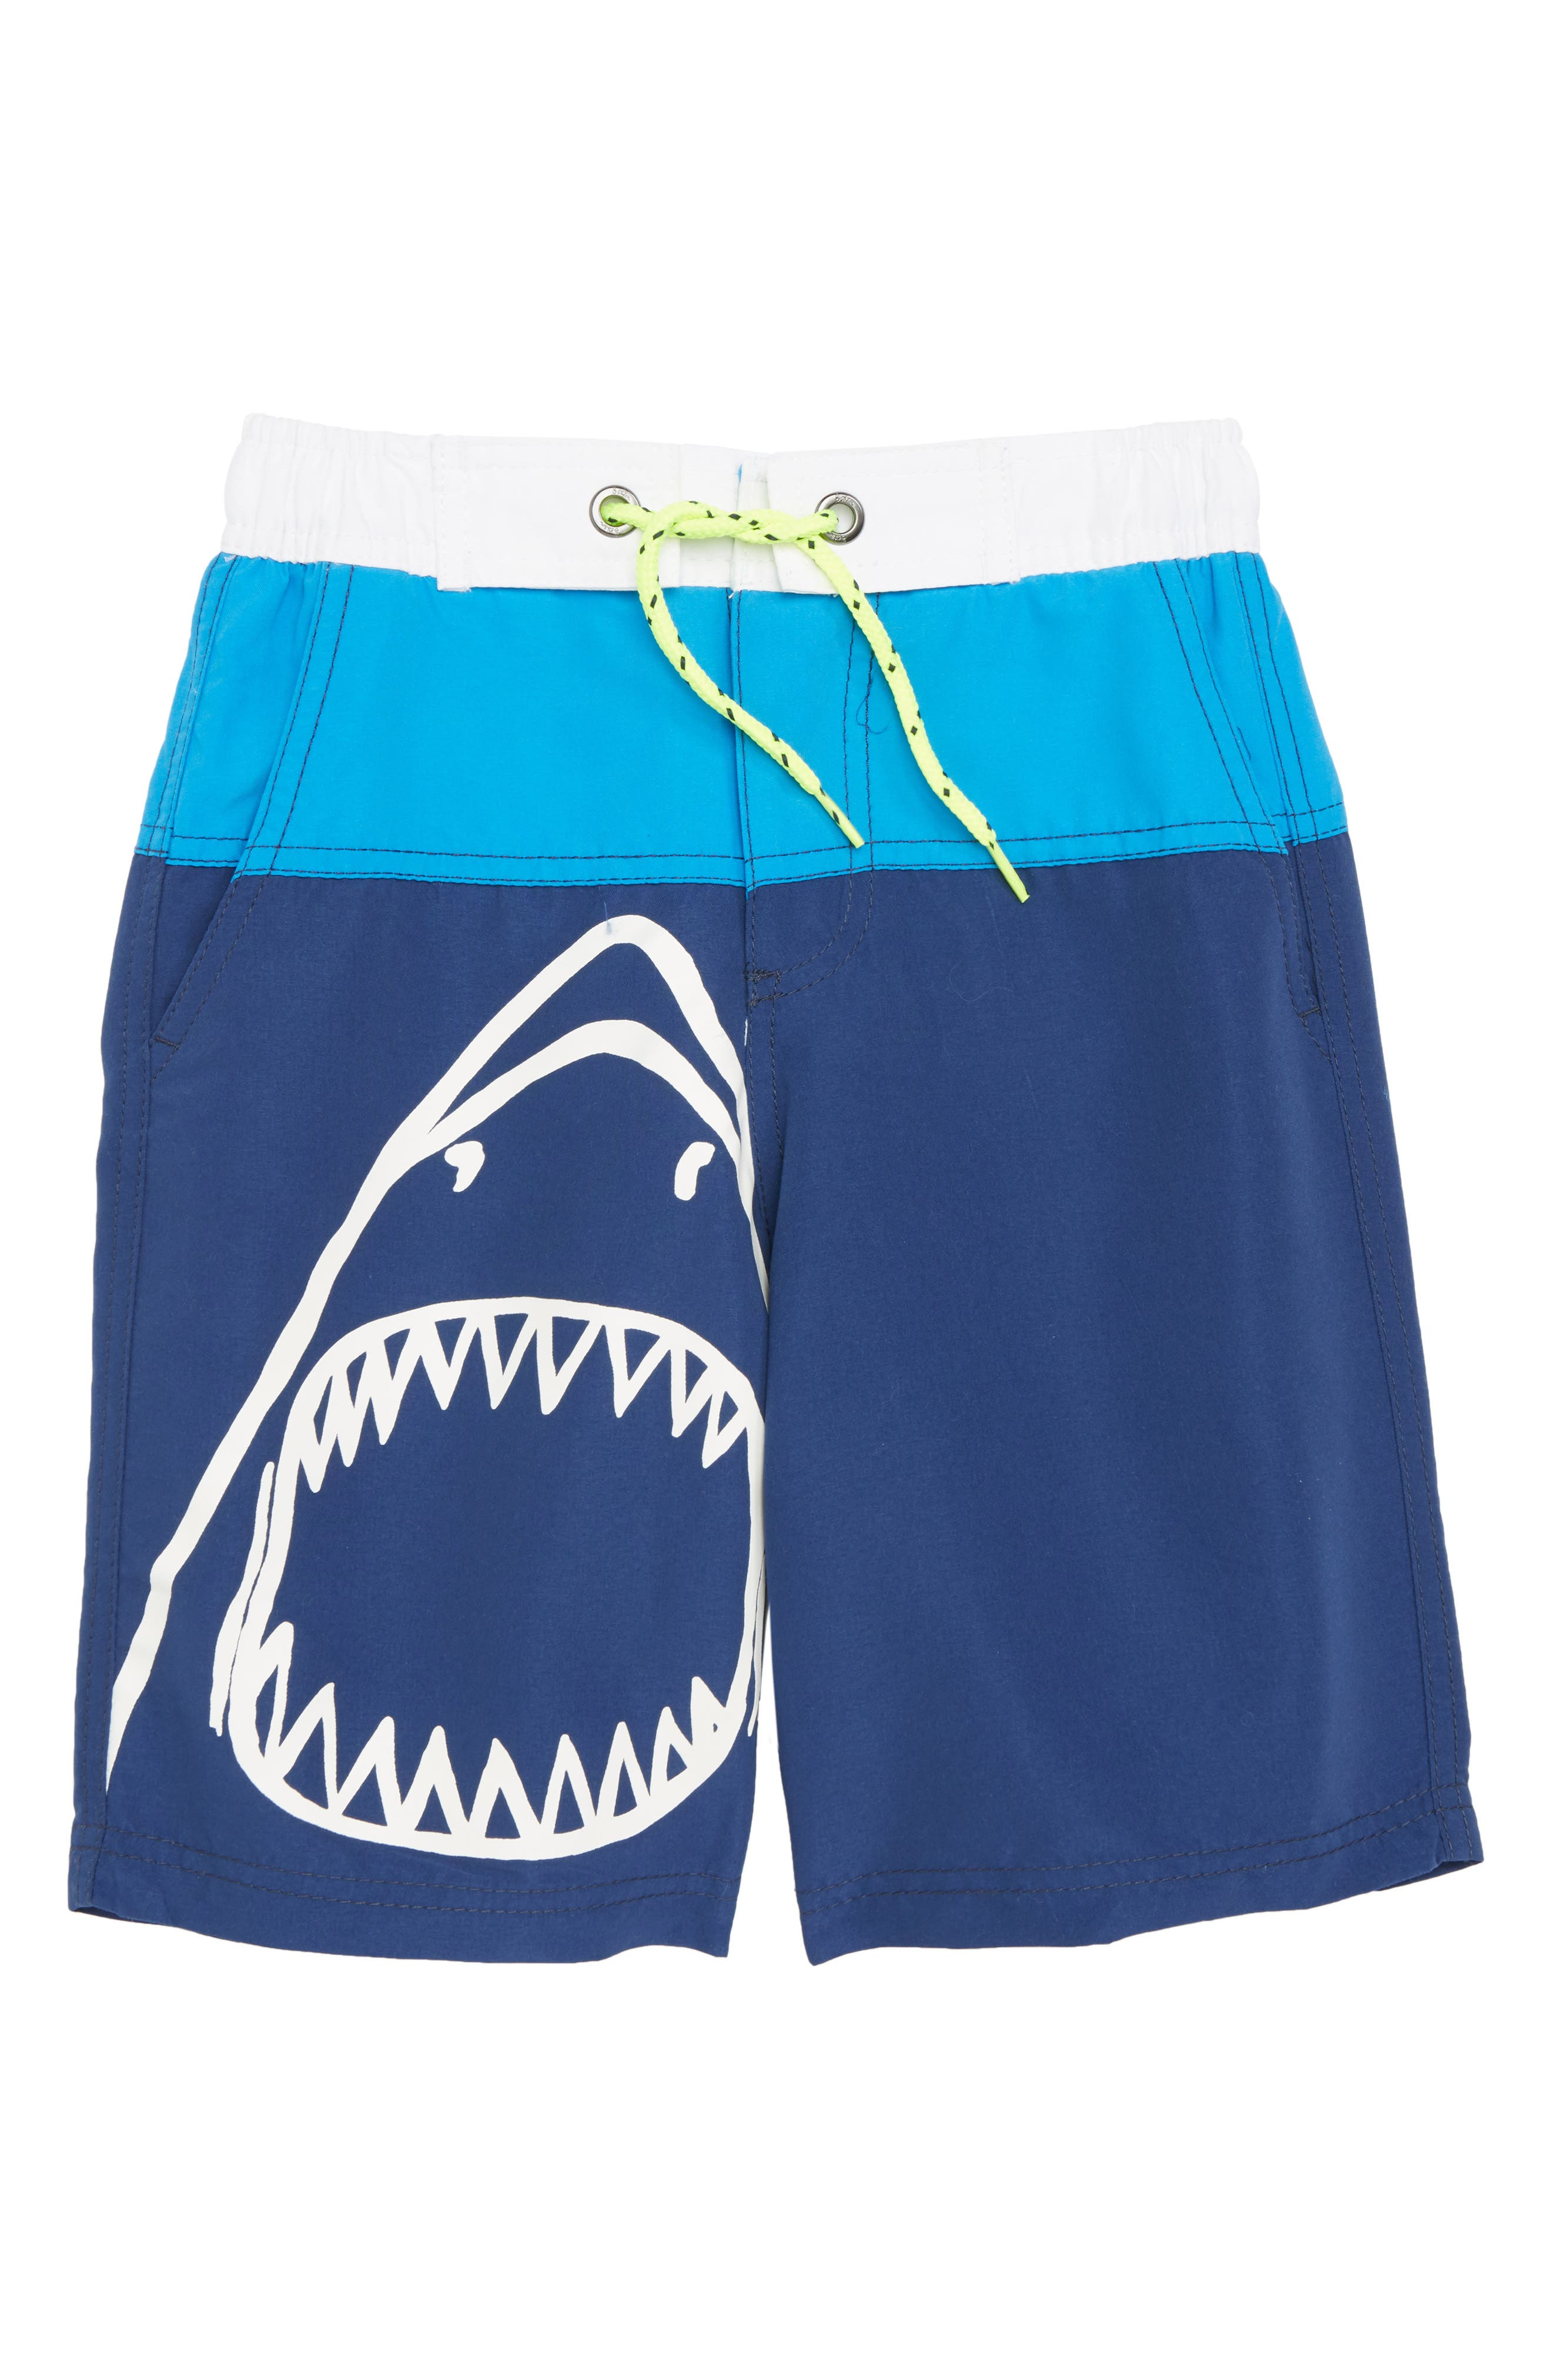 Shark Board Shorts,                             Main thumbnail 1, color,                             Electric Blue Lemonade